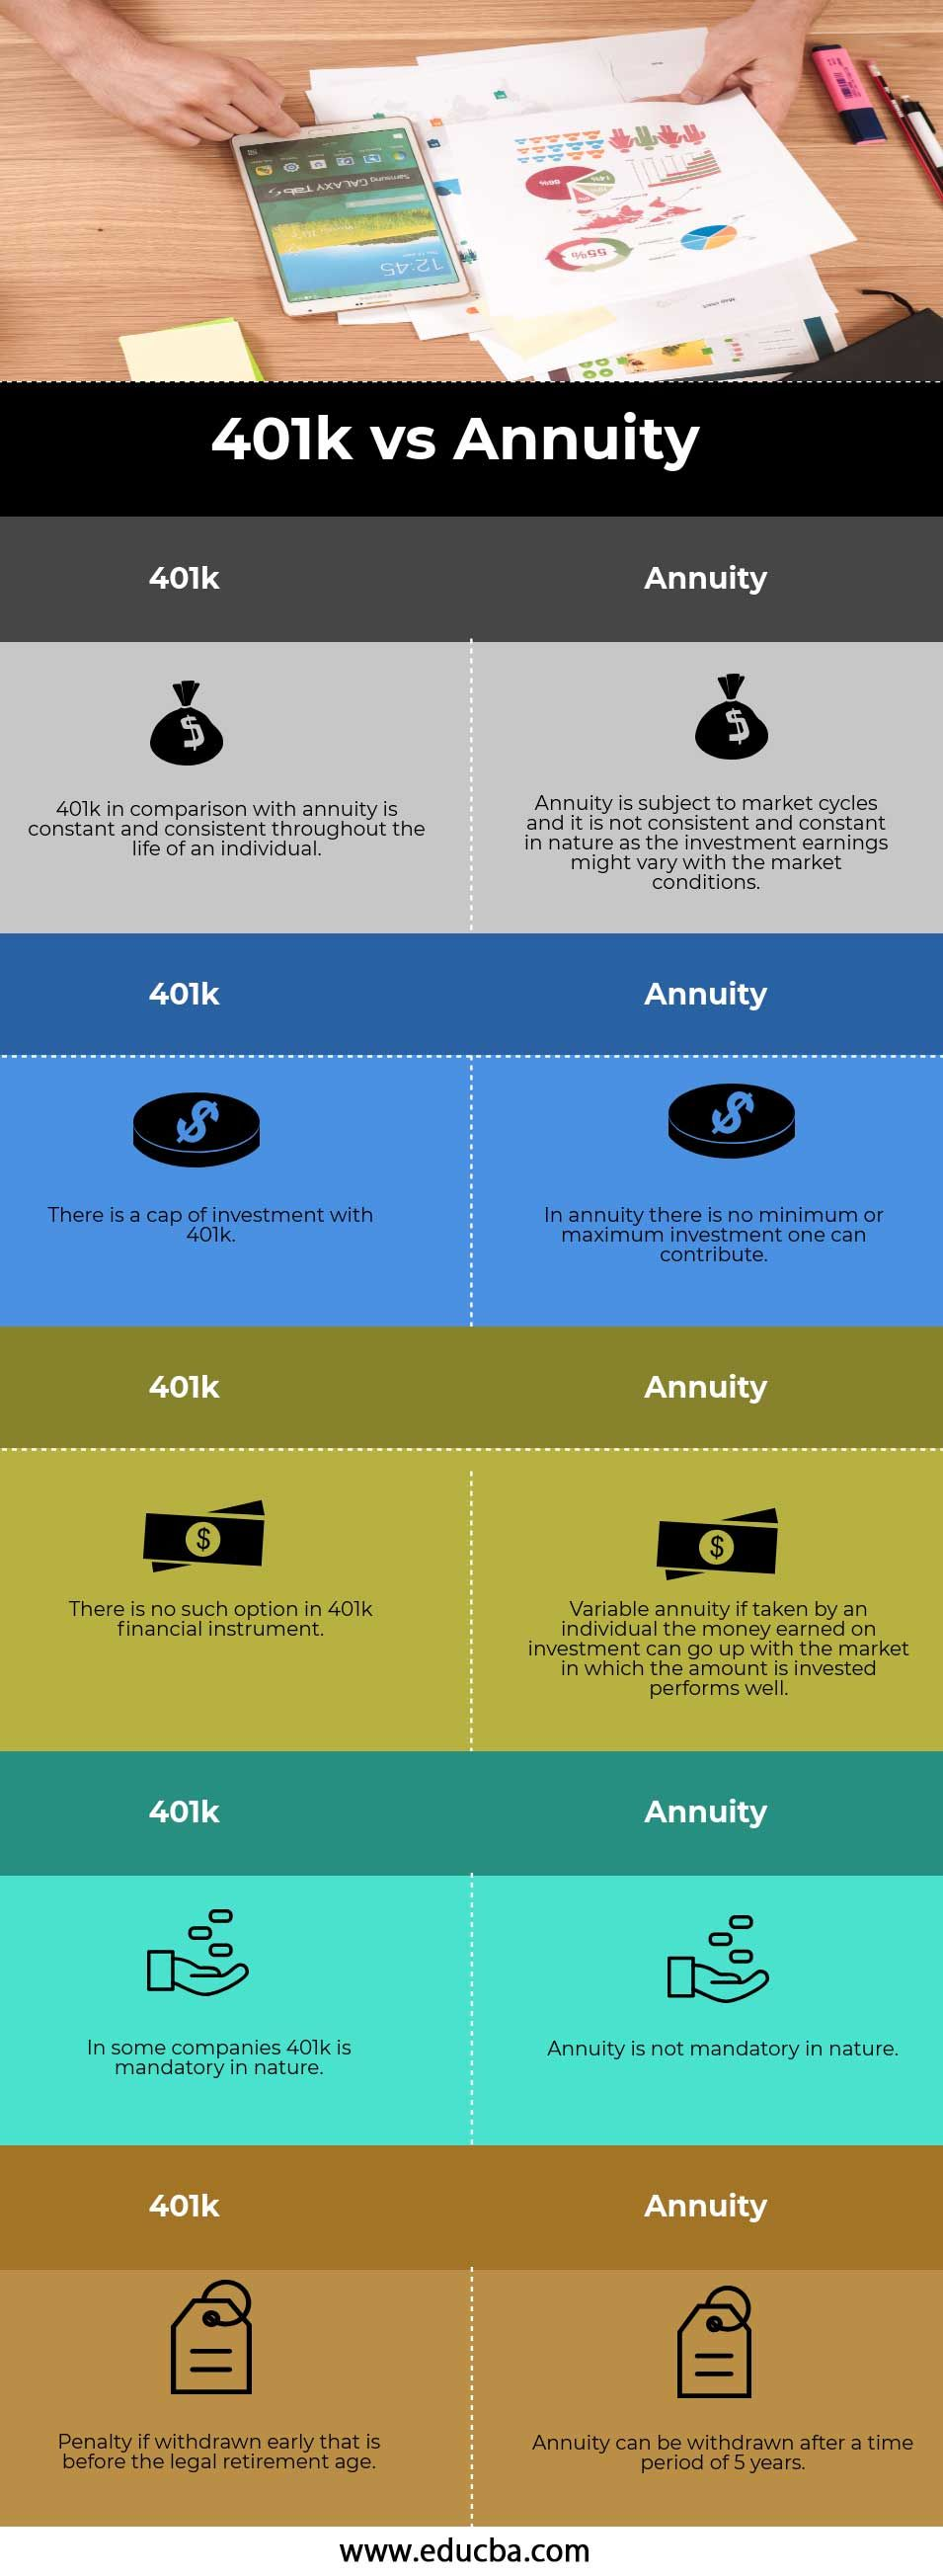 401k vs Annuity Annuity, Annuity retirement, Retirement